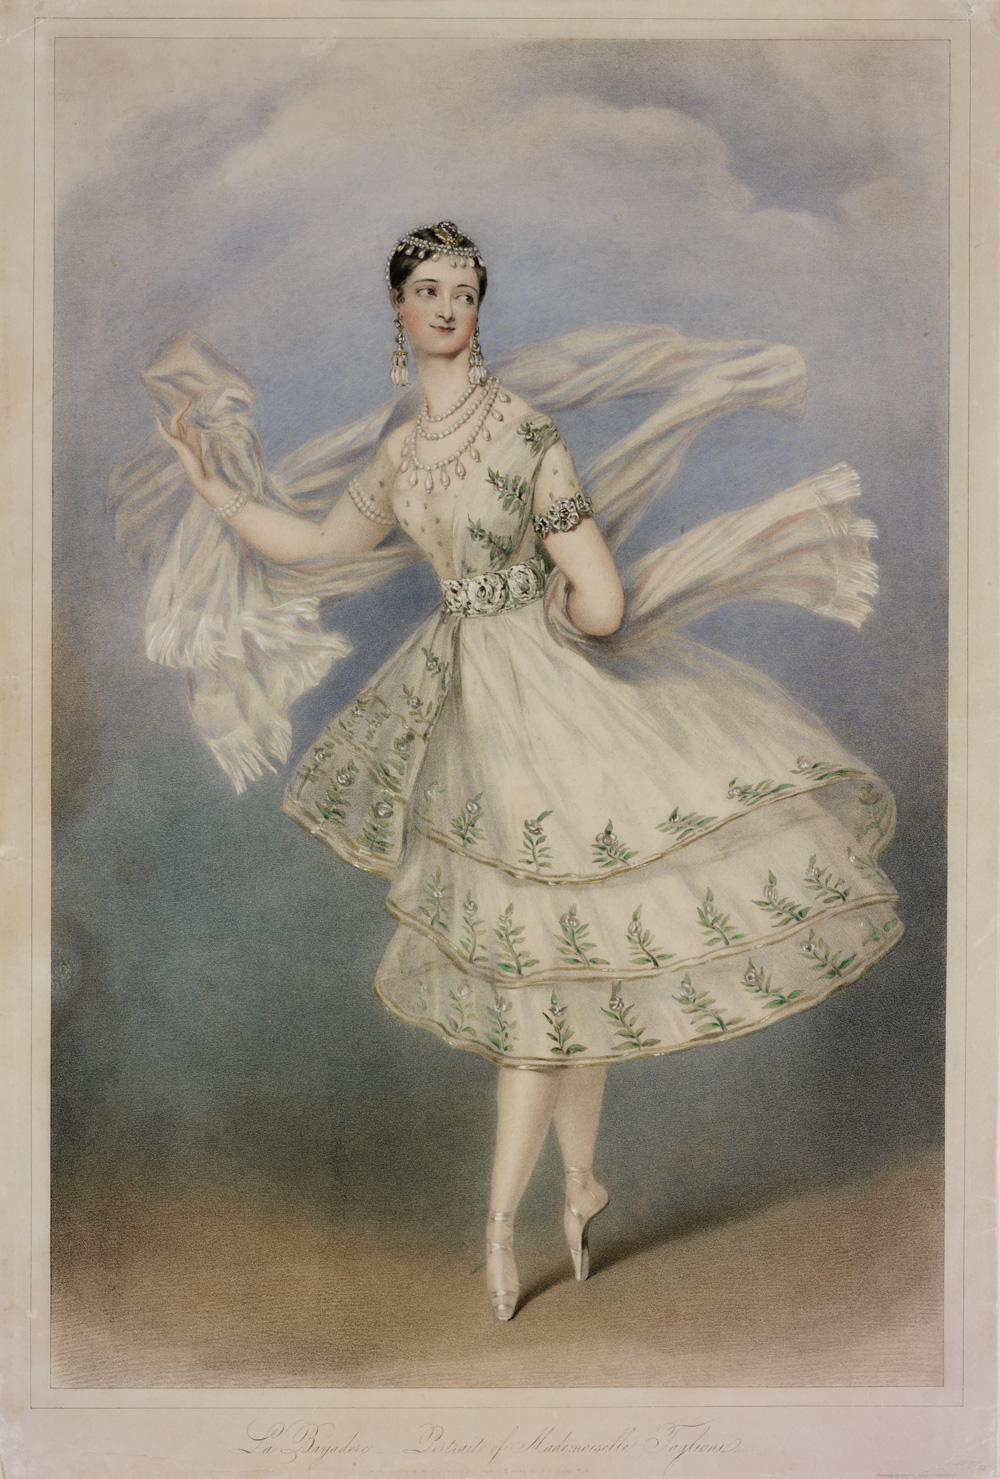 Marie Taglioni as Bayadère, coloured lithograph, 1831. V&A Museum.